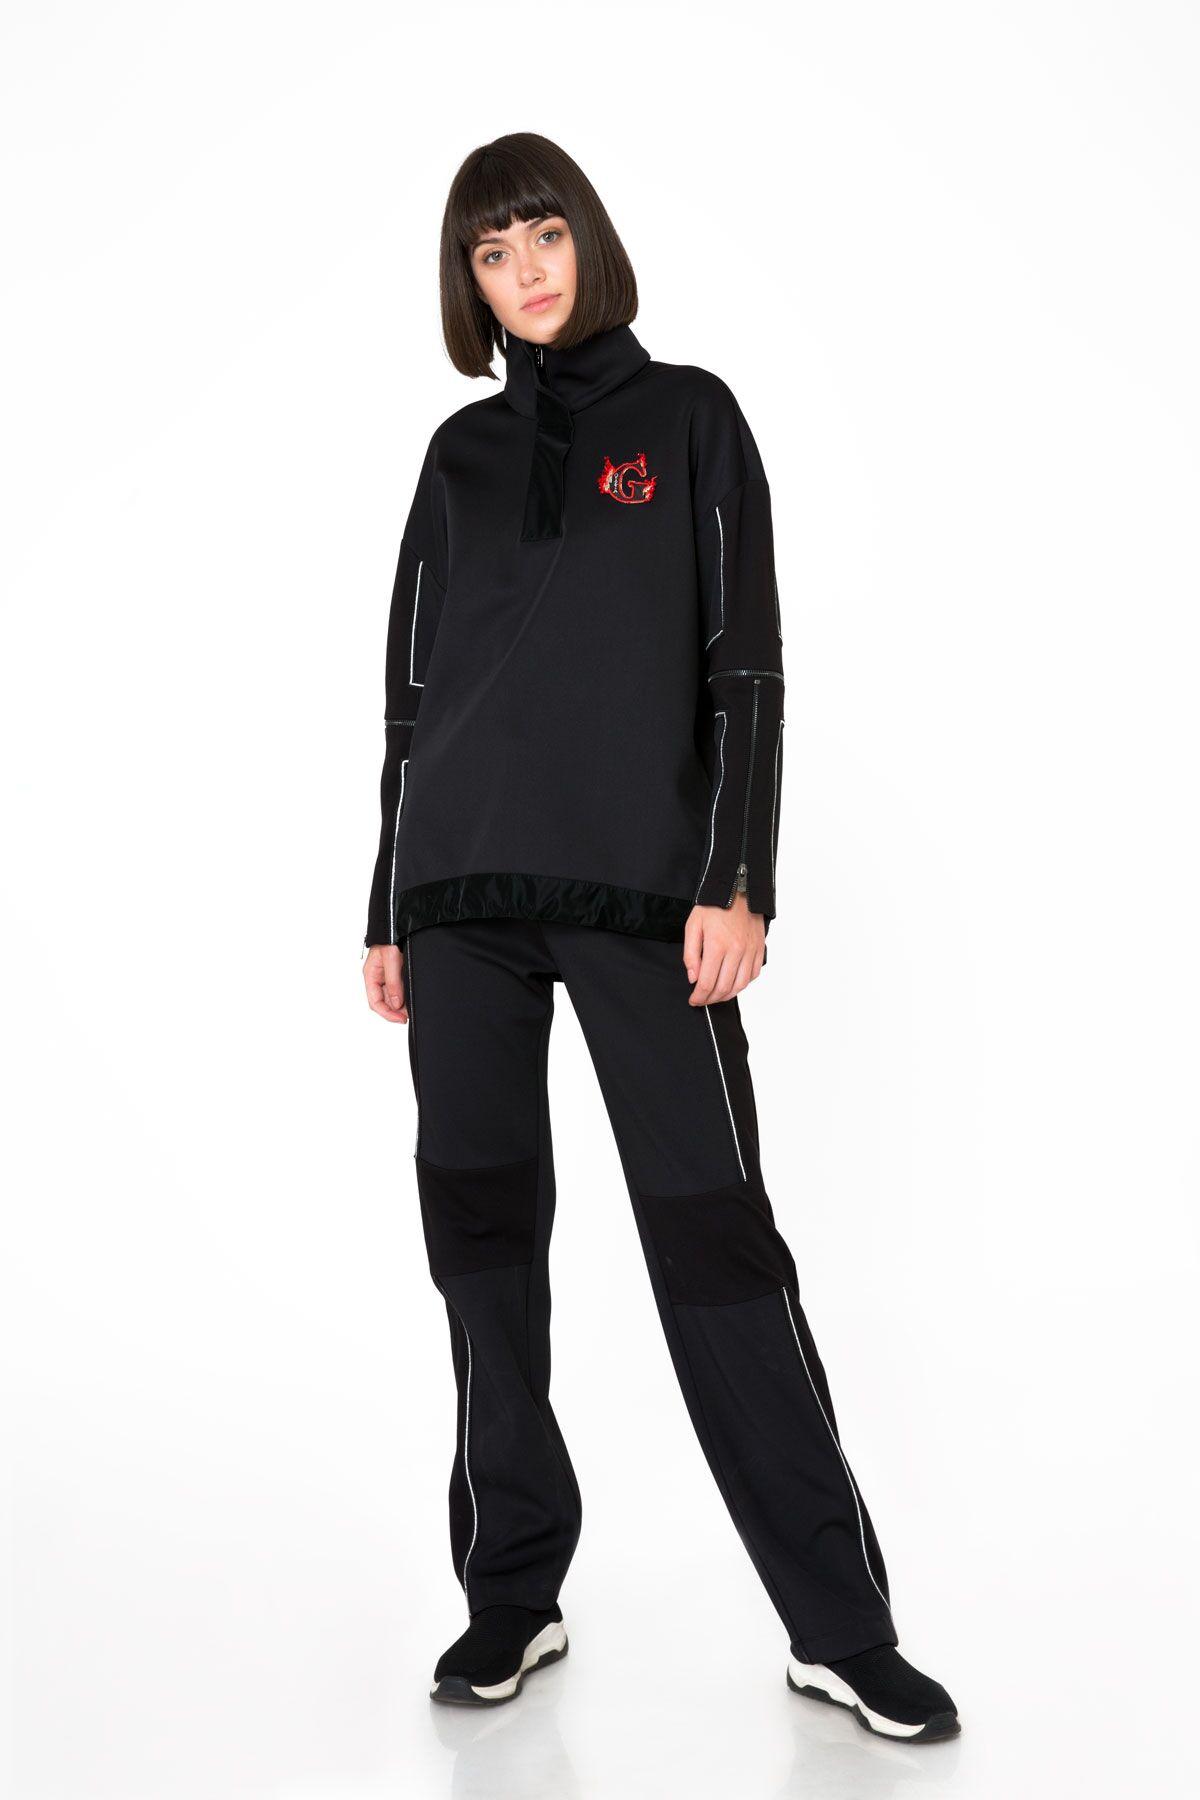 Black Sweatshirt with Collar and Sleeve Zipper Detail